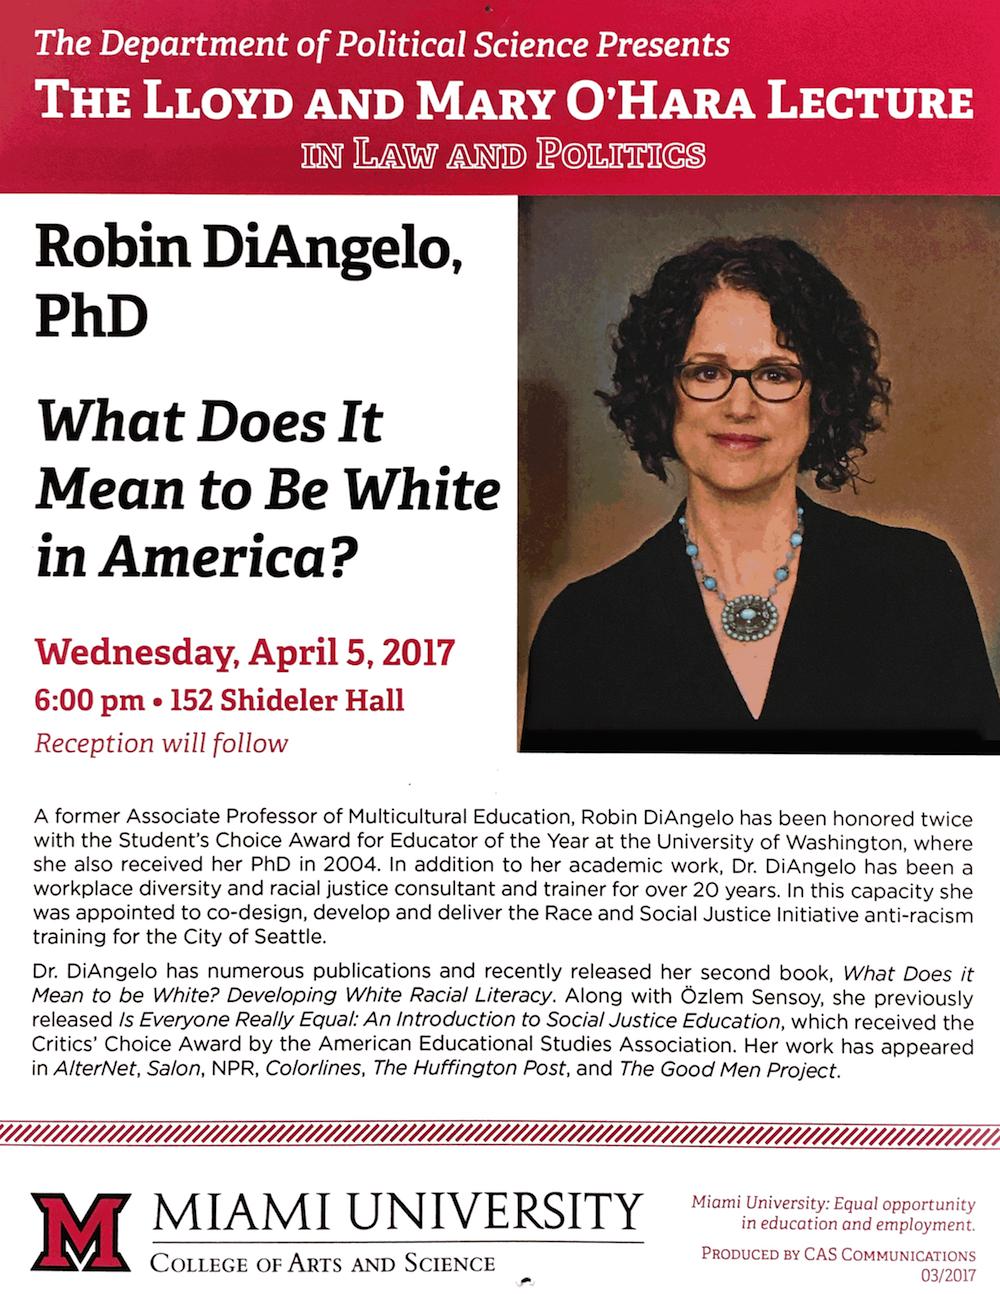 O'Hara Lecture